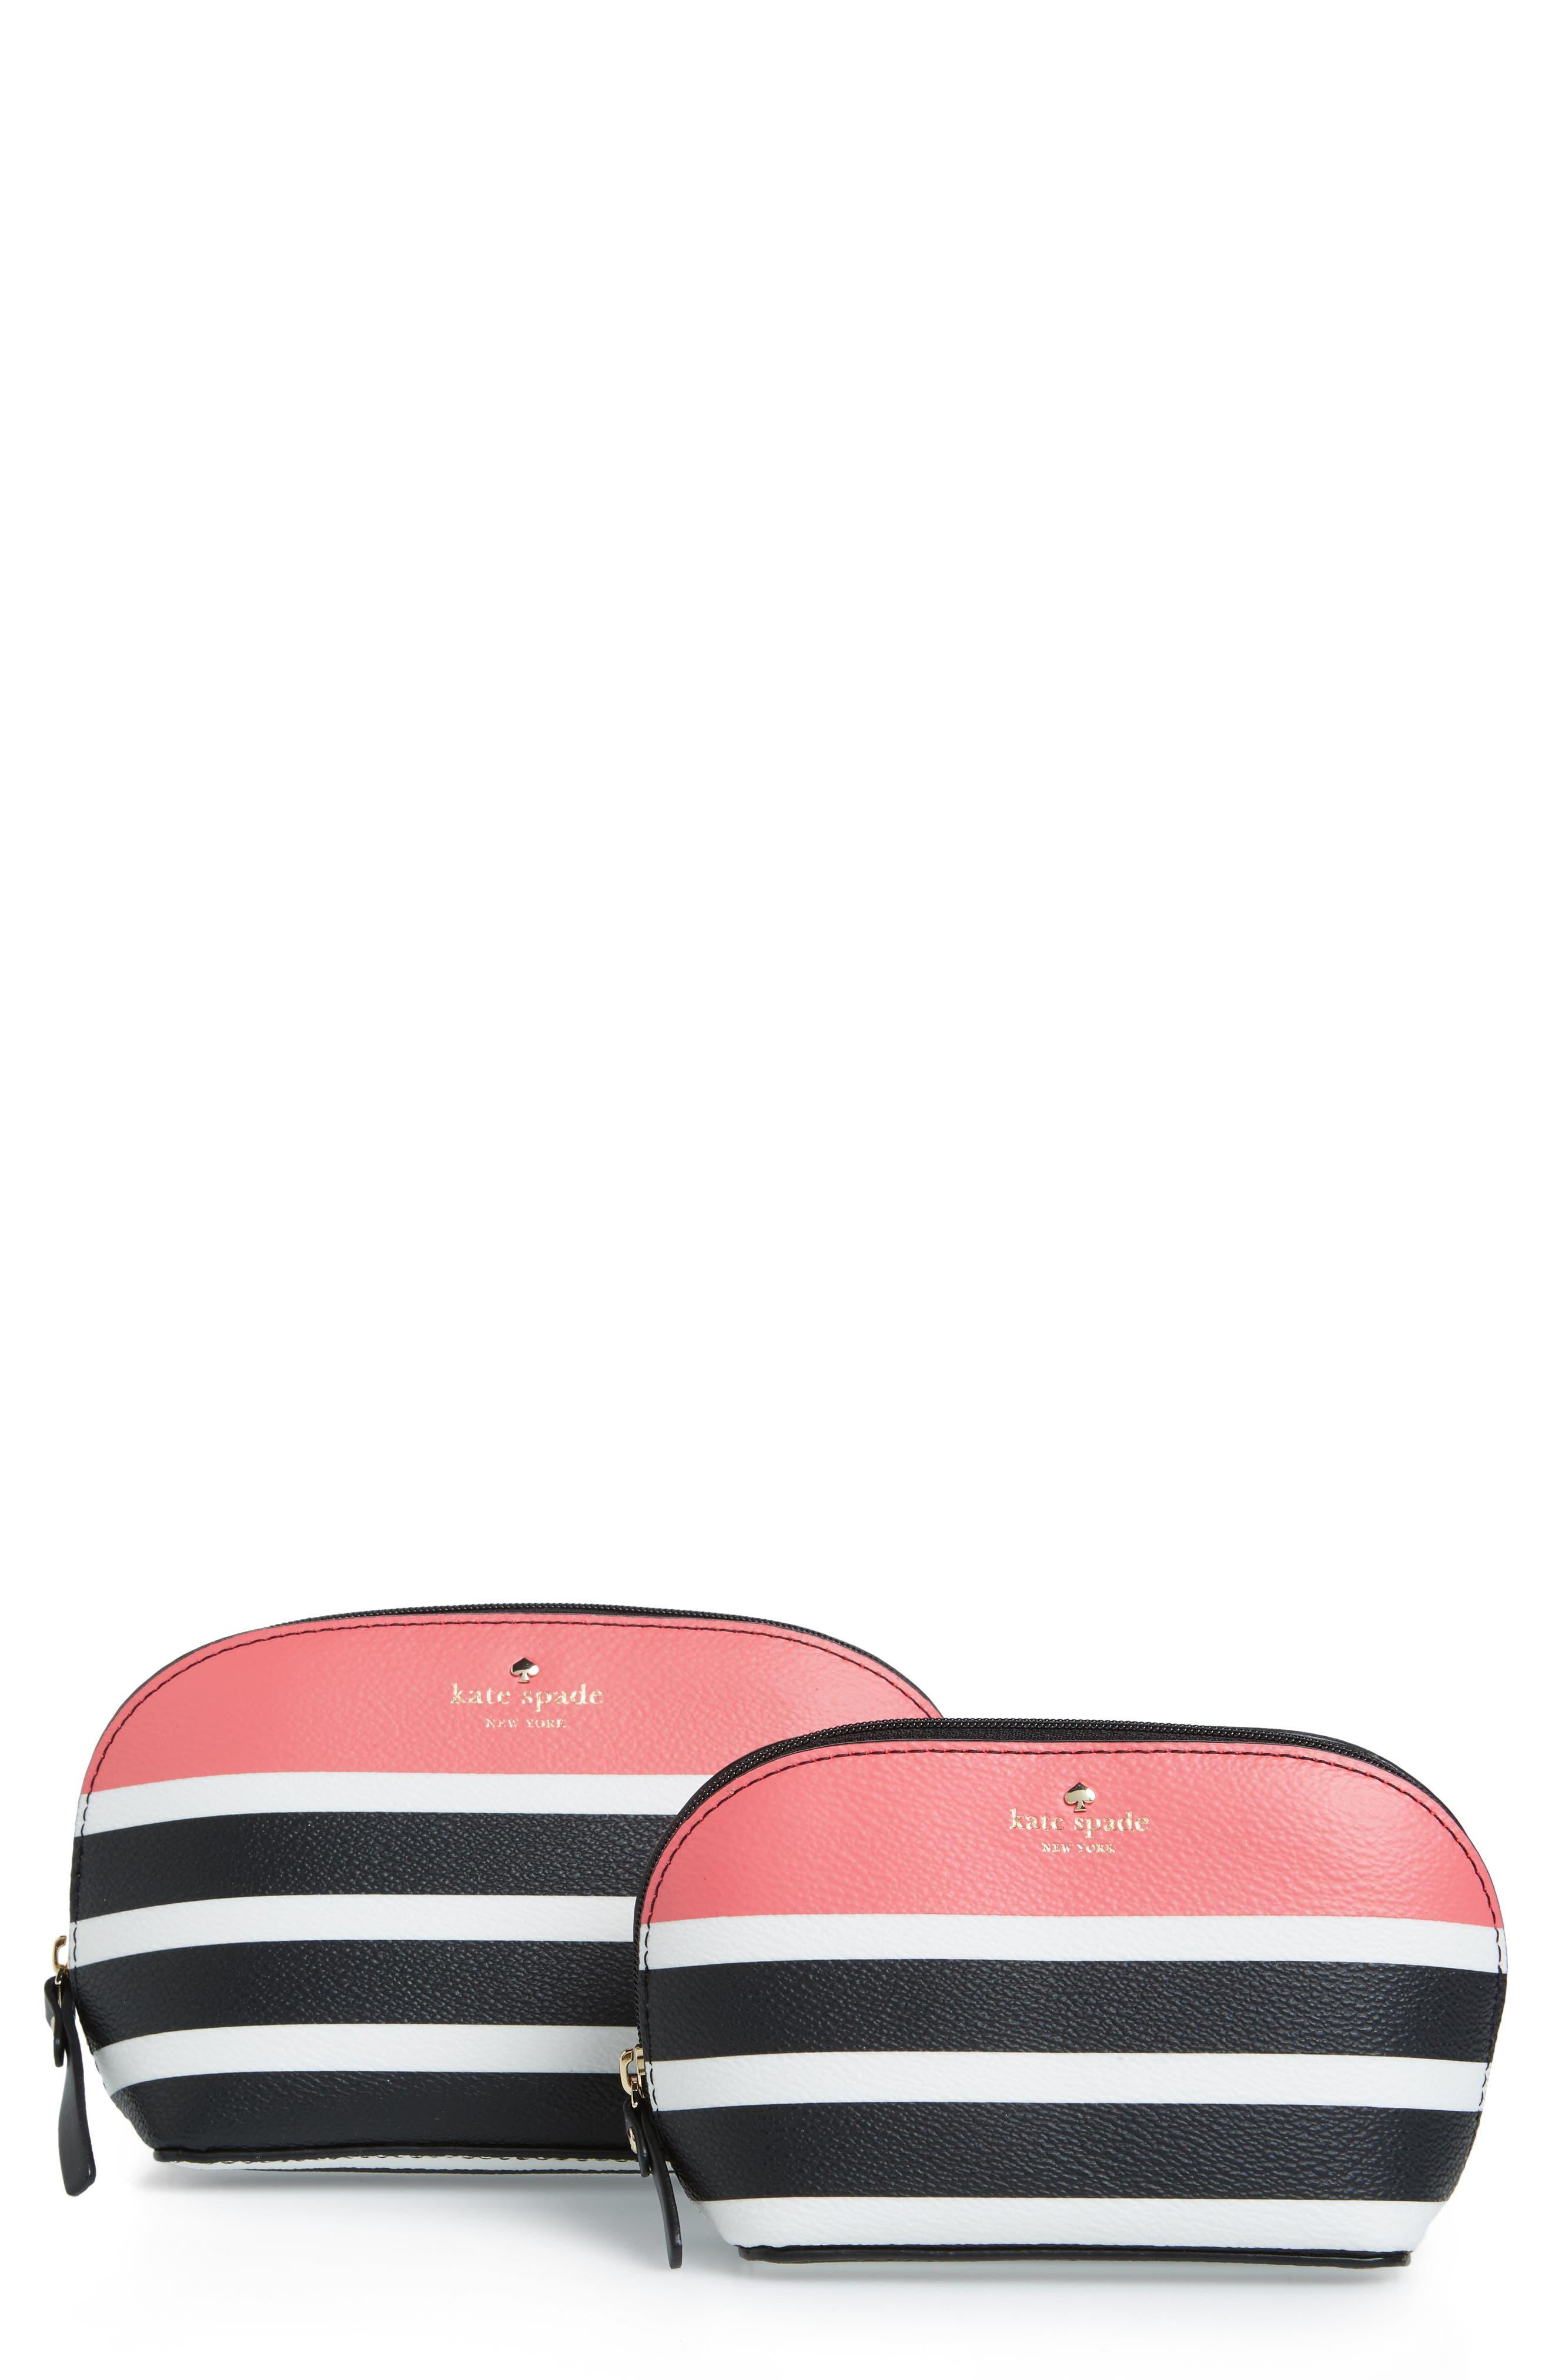 hyde lane stripe abalene set of 2 faux leather pouches,                             Main thumbnail 1, color,                             001